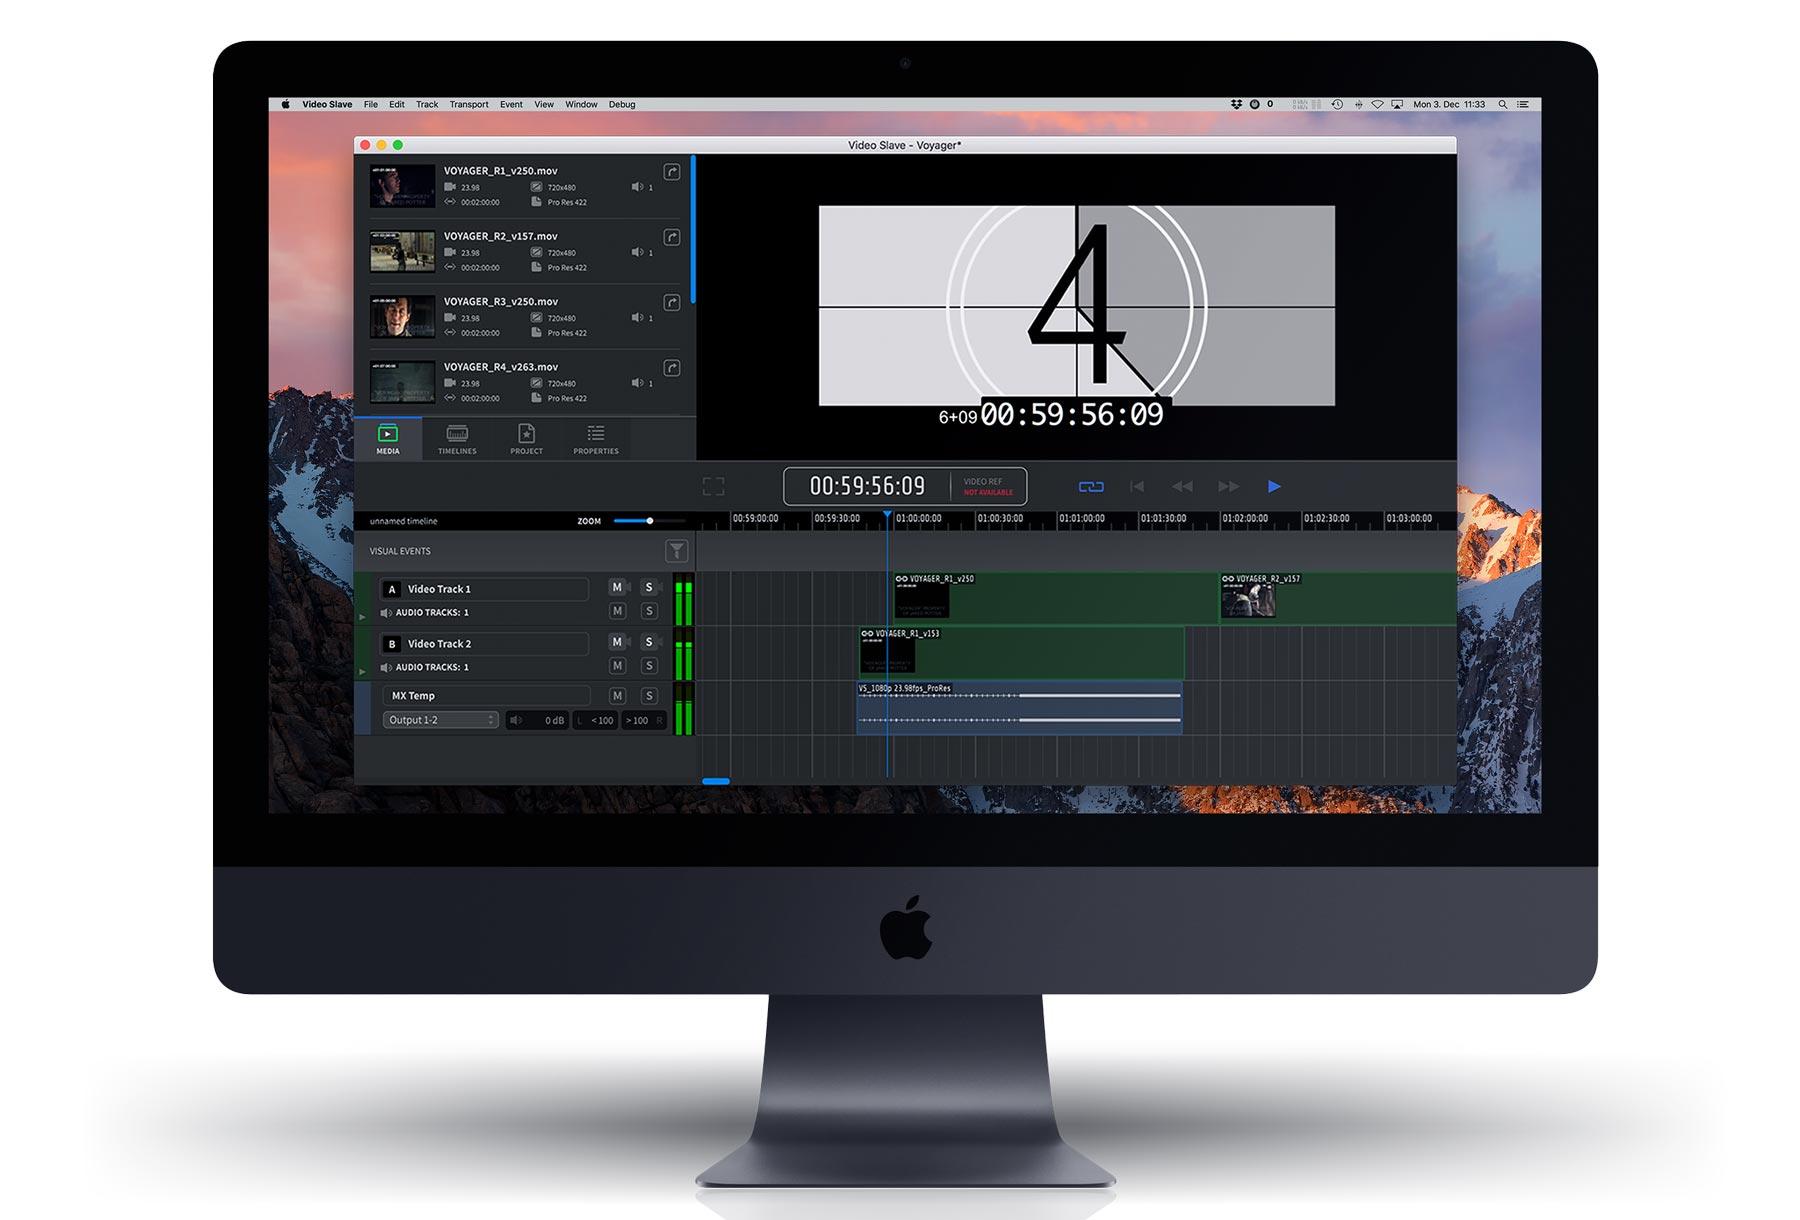 Video Slave 4 Pro